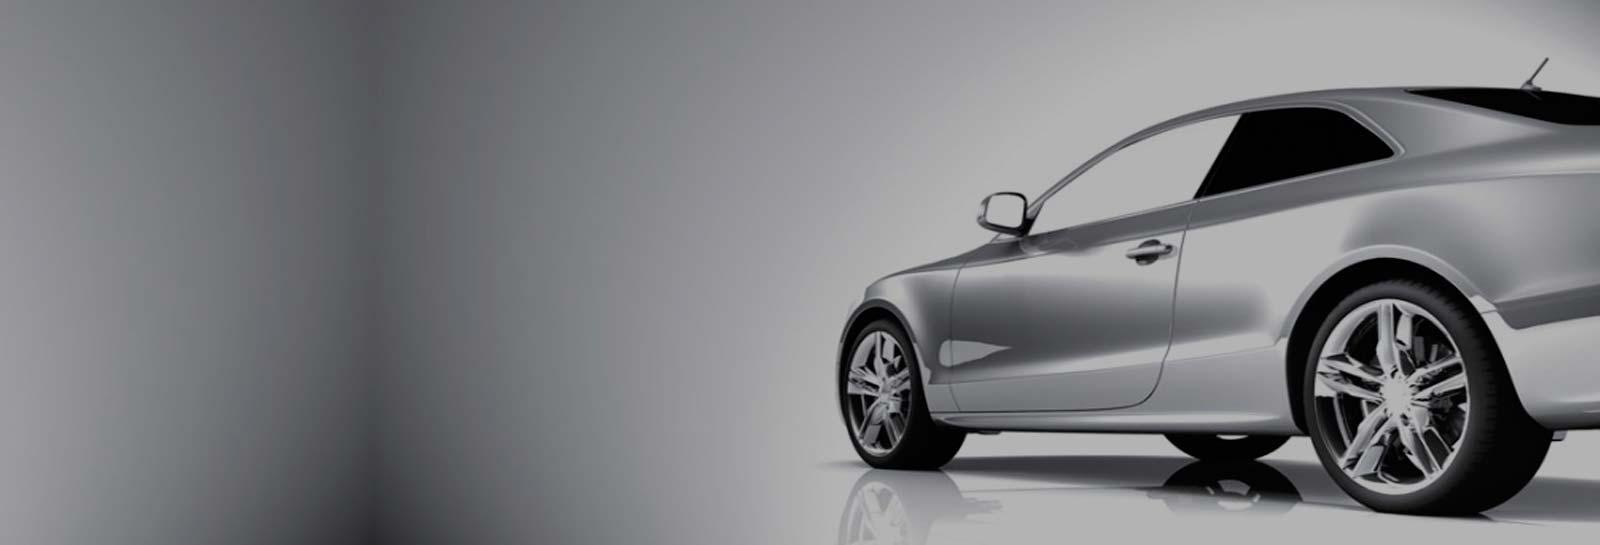 TGC Auto, láminas adhesívas